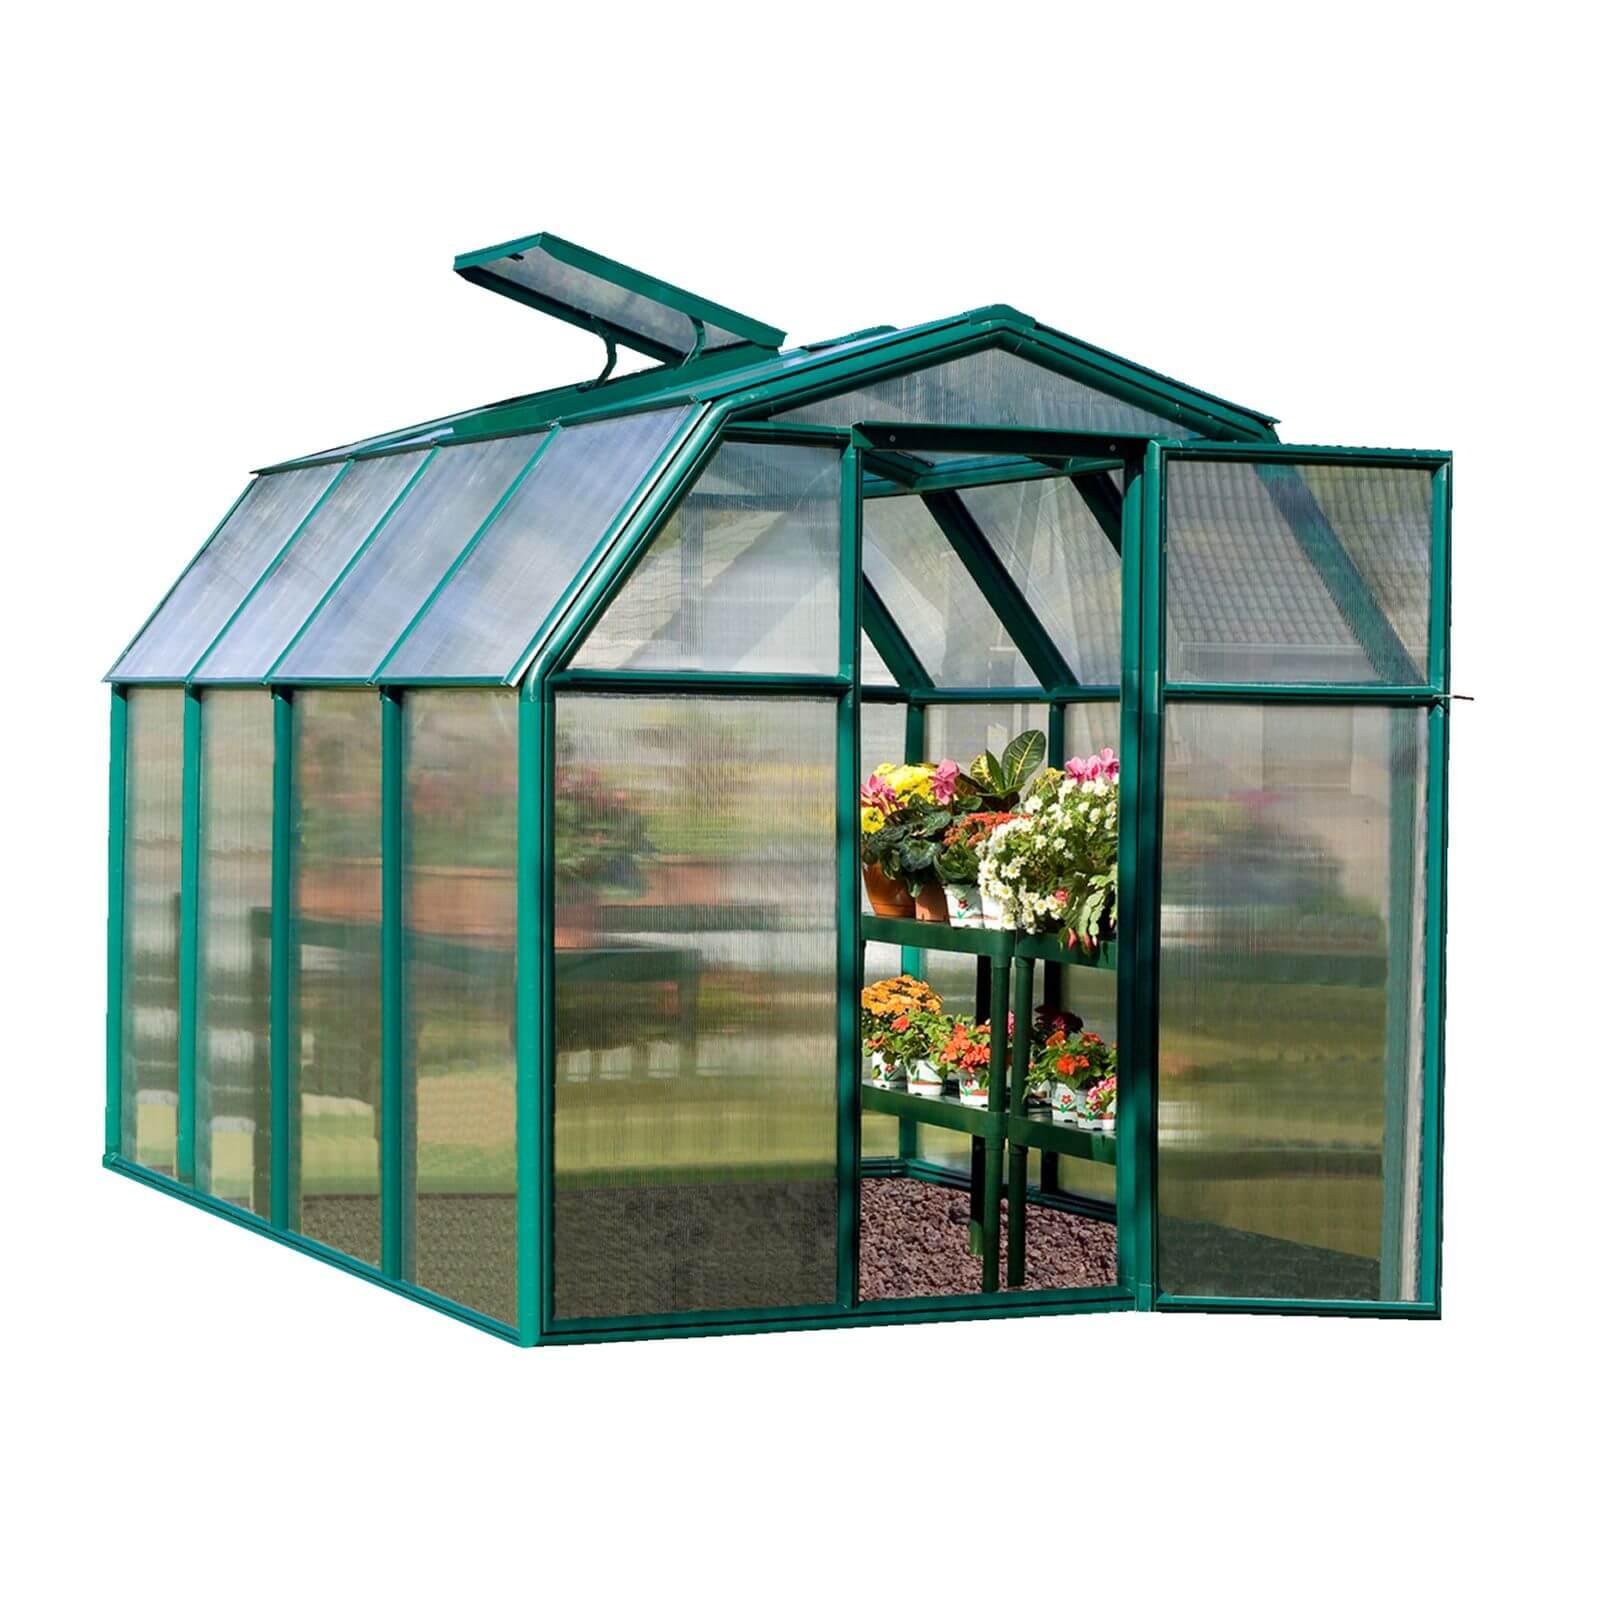 Palram - Canopia Eco Grow Greenhouse 6X8 Green